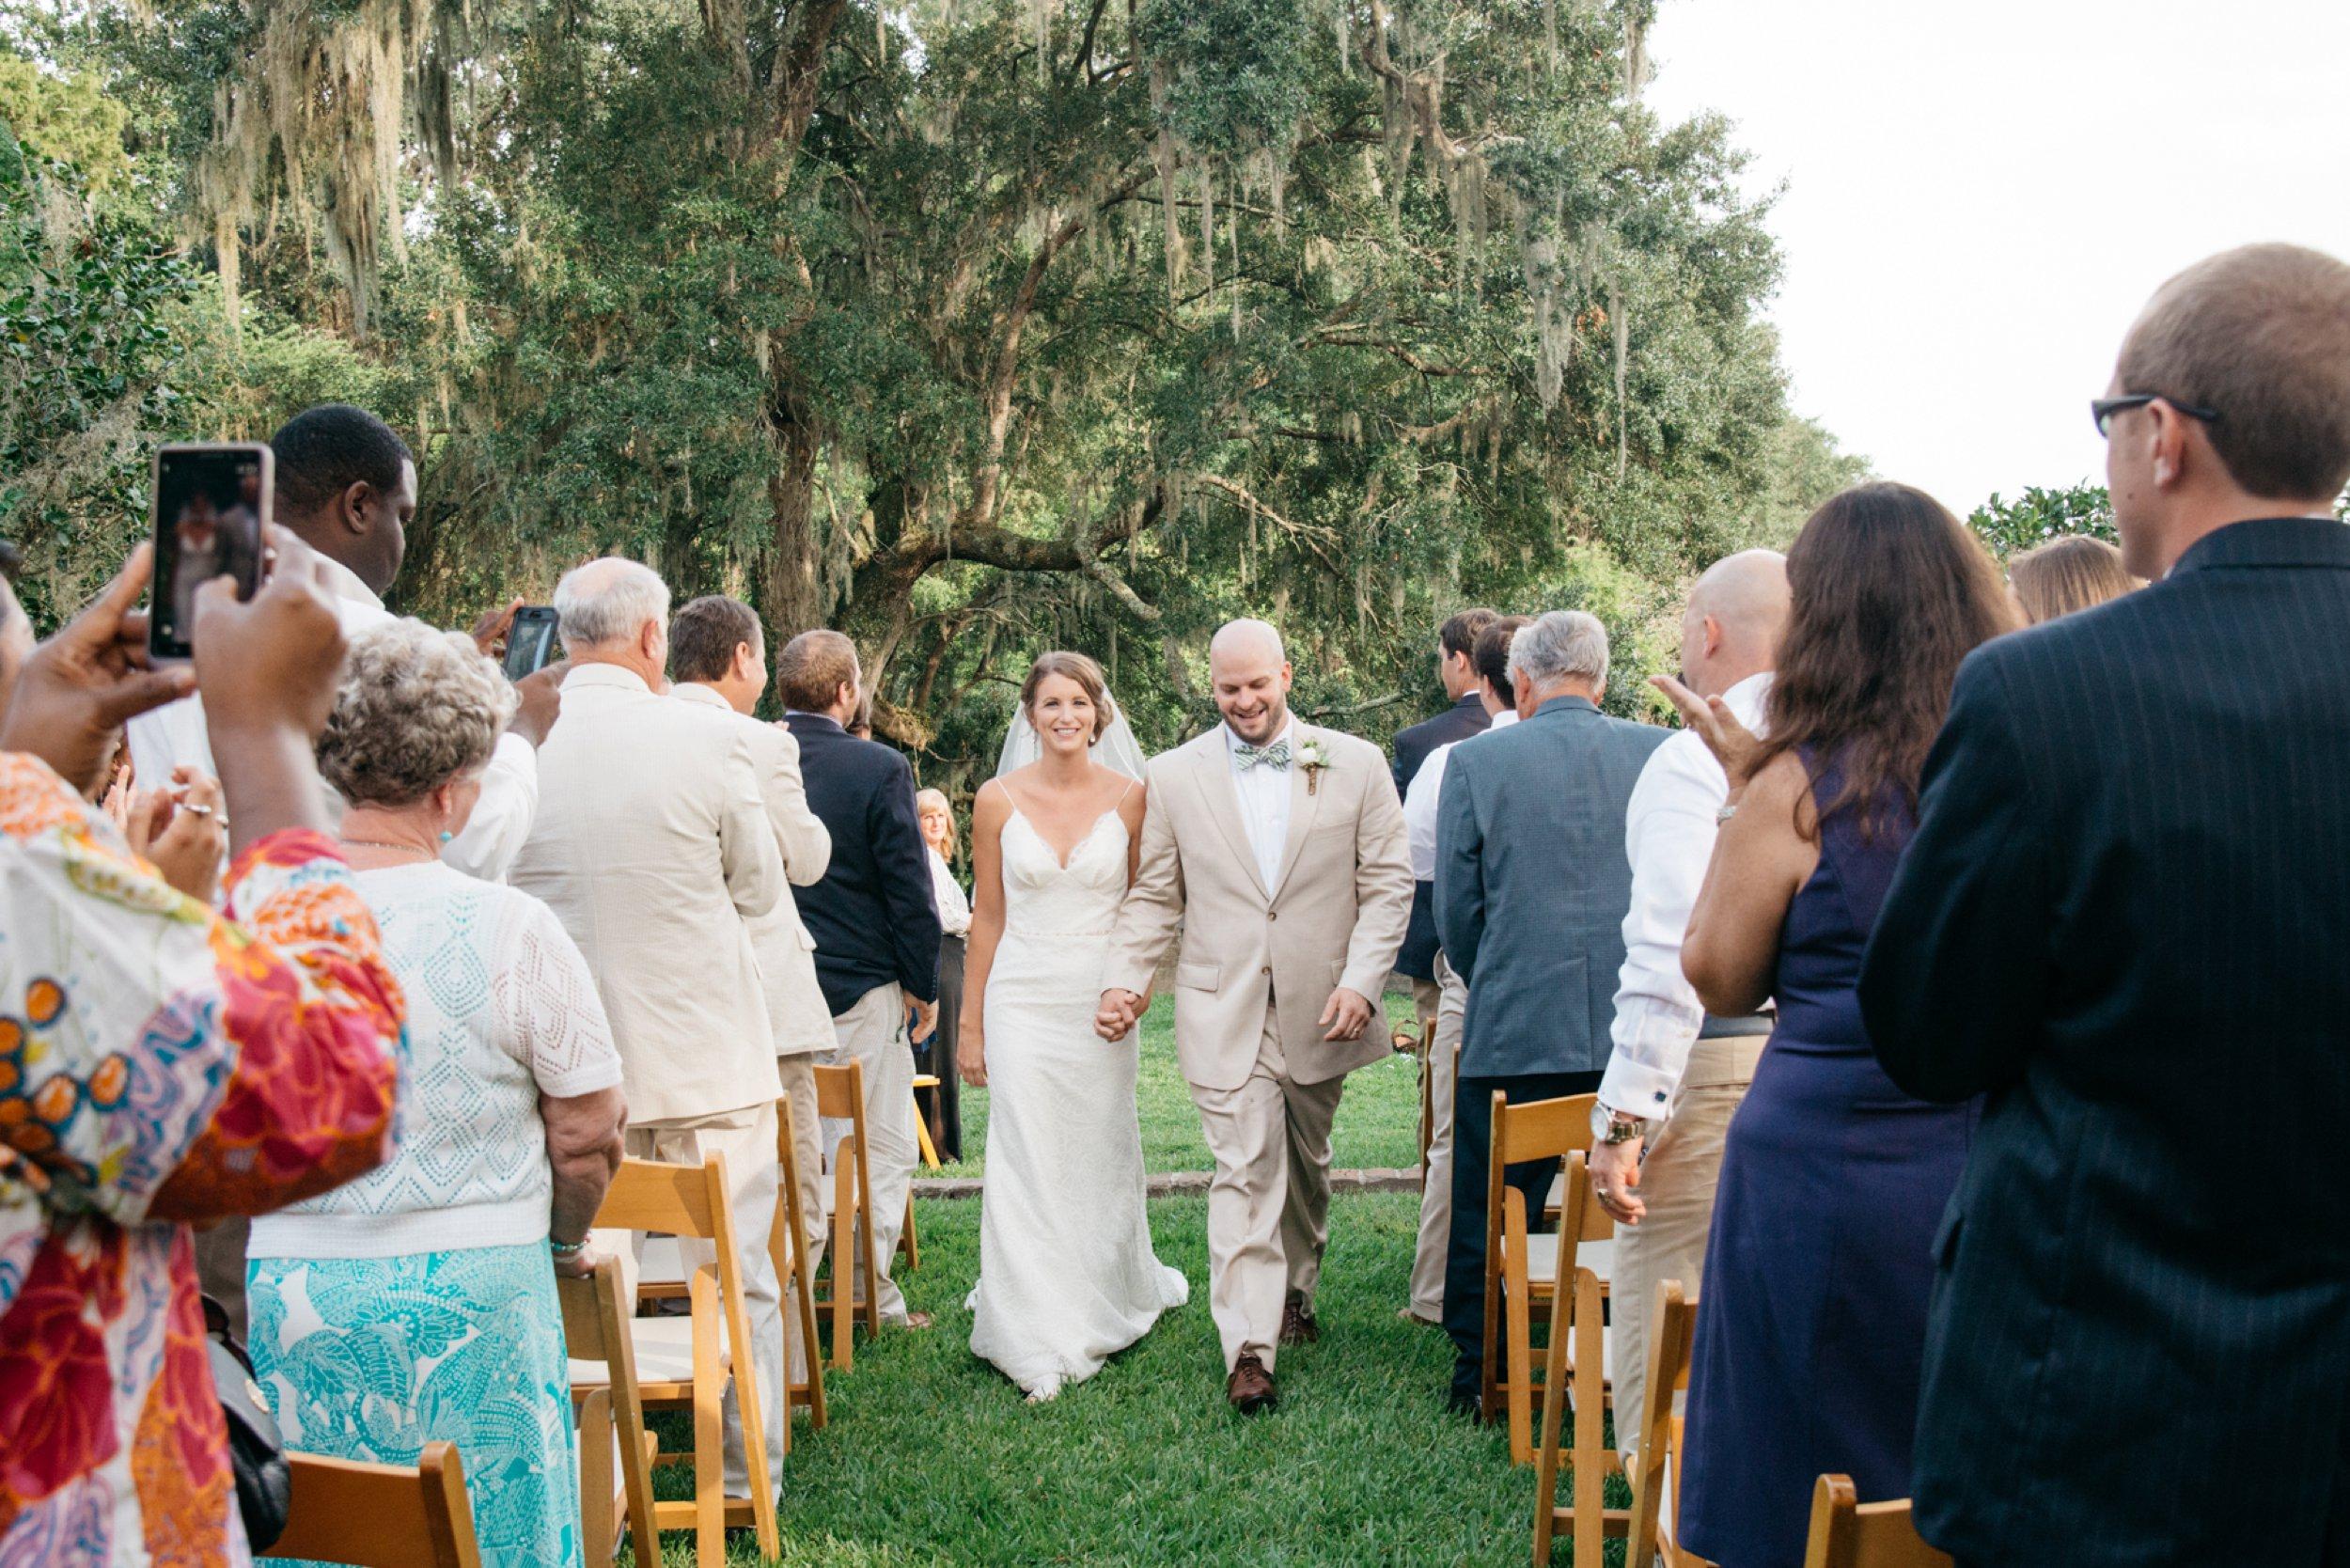 mepkin-abbey-wedding-28.jpg